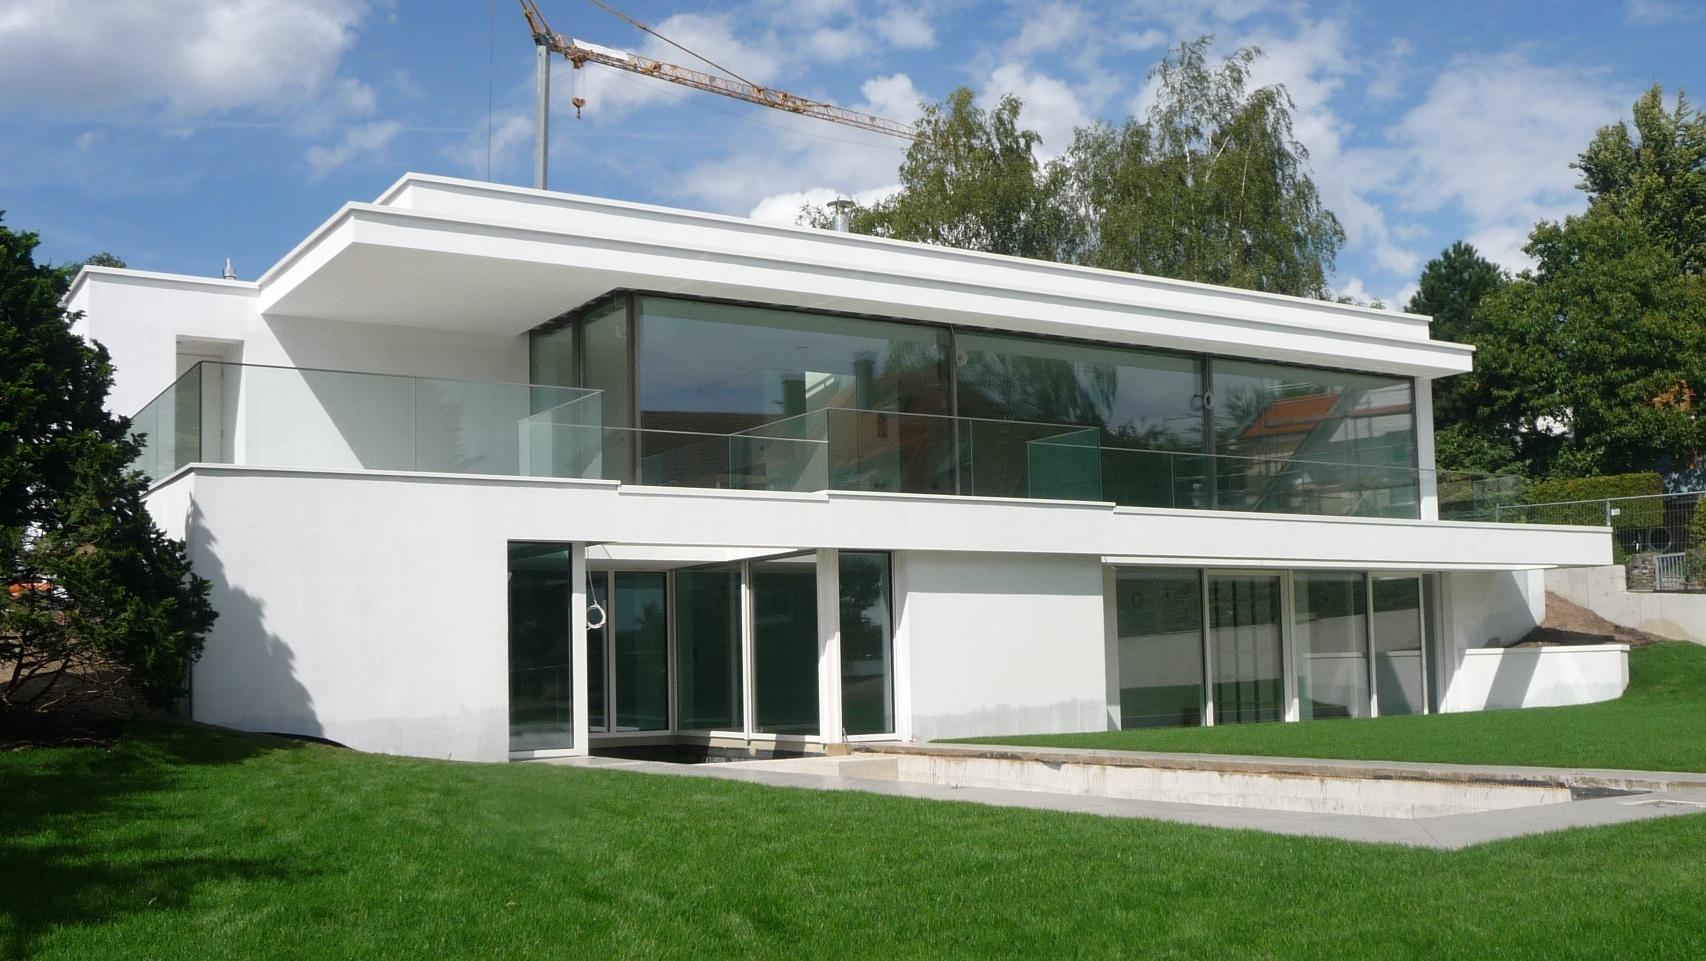 Hans joachim wienert kronberg for Moderne villa bauen